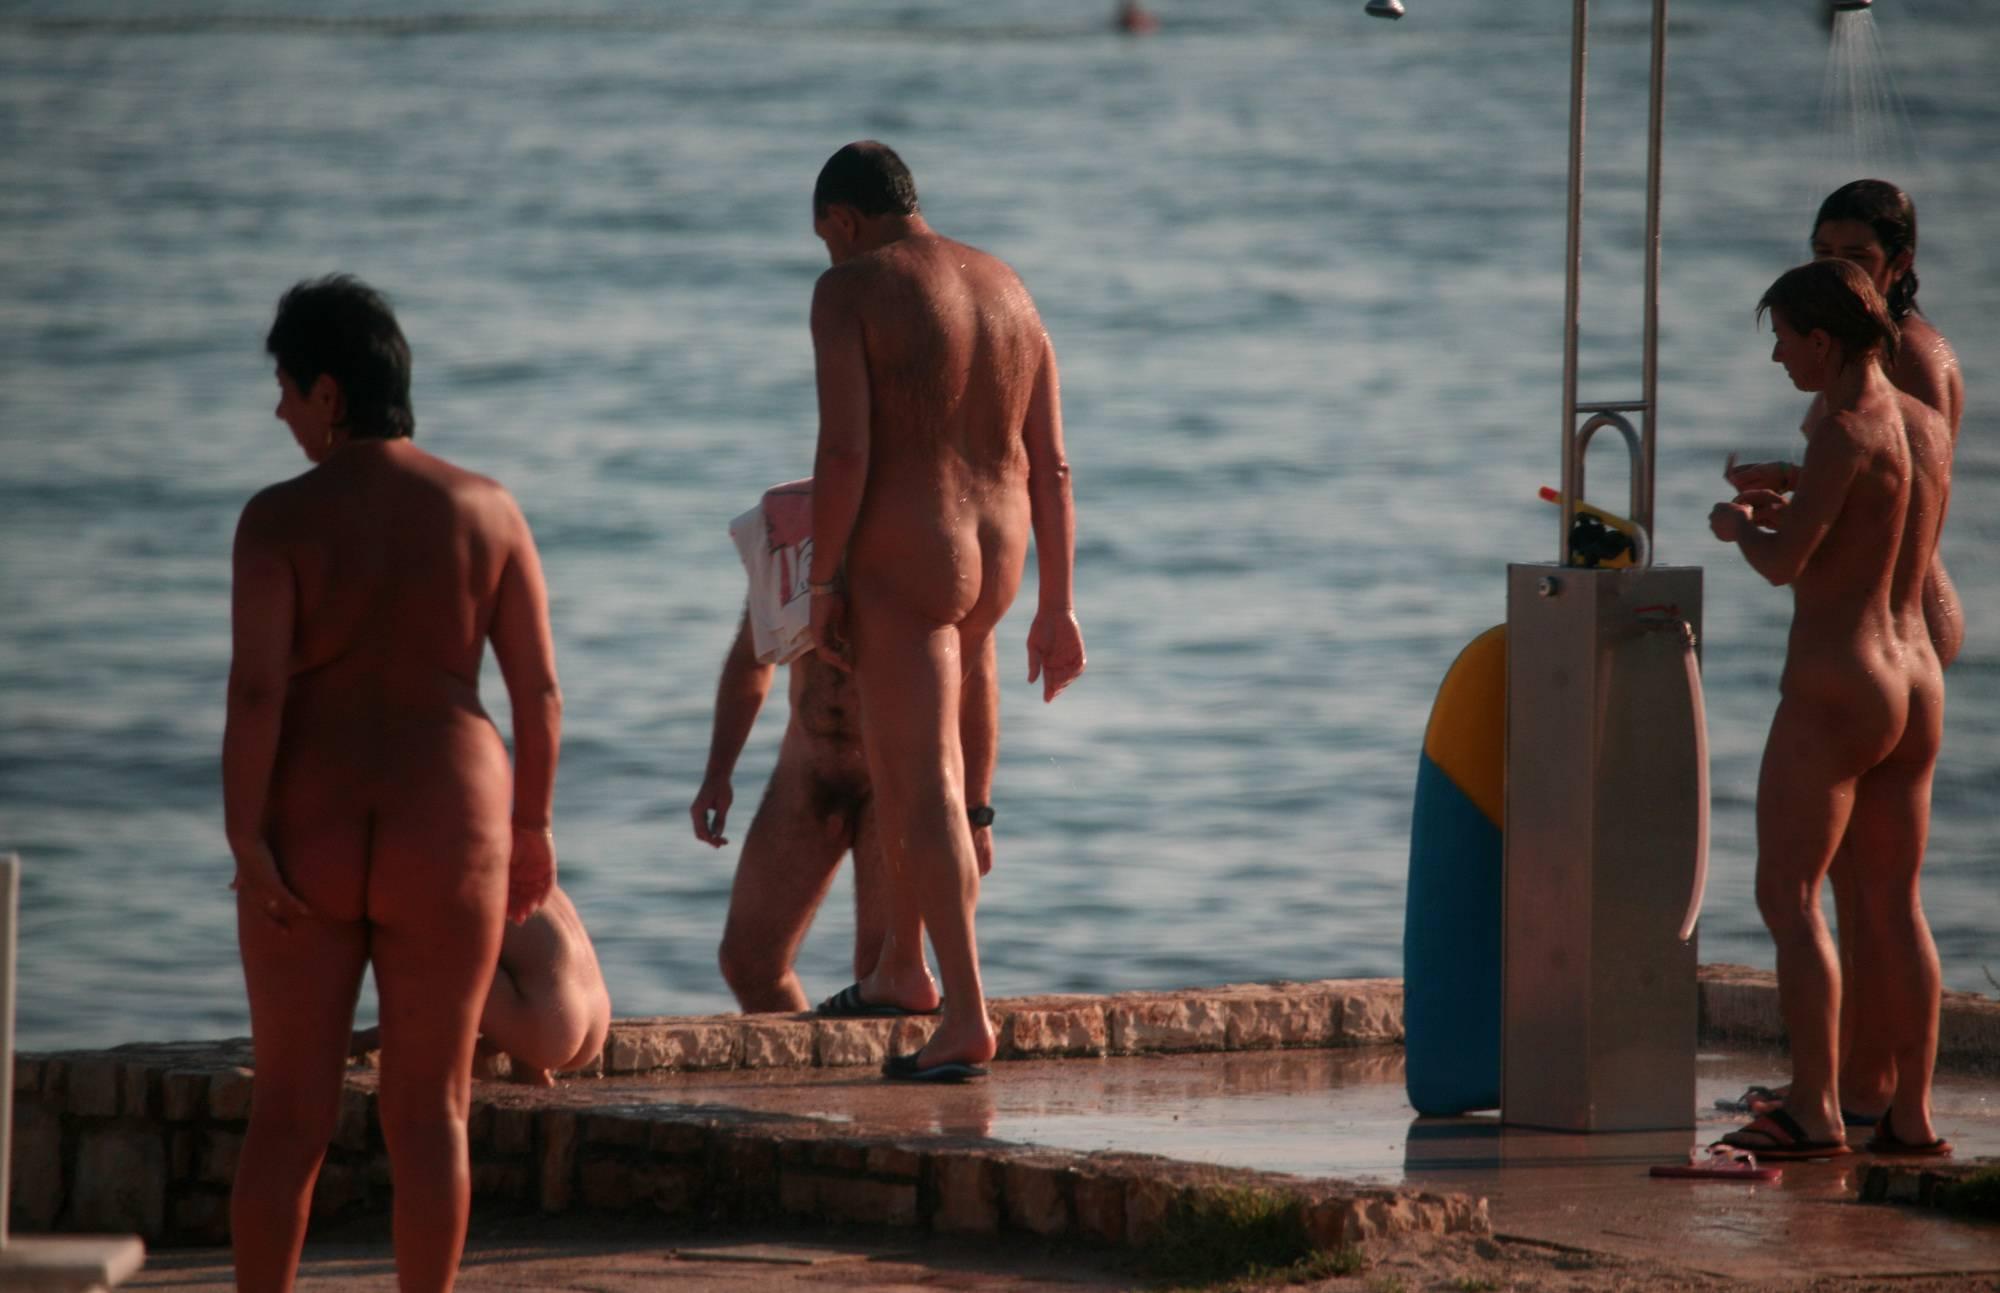 Nudist Photos Naturist Shower Series - 2